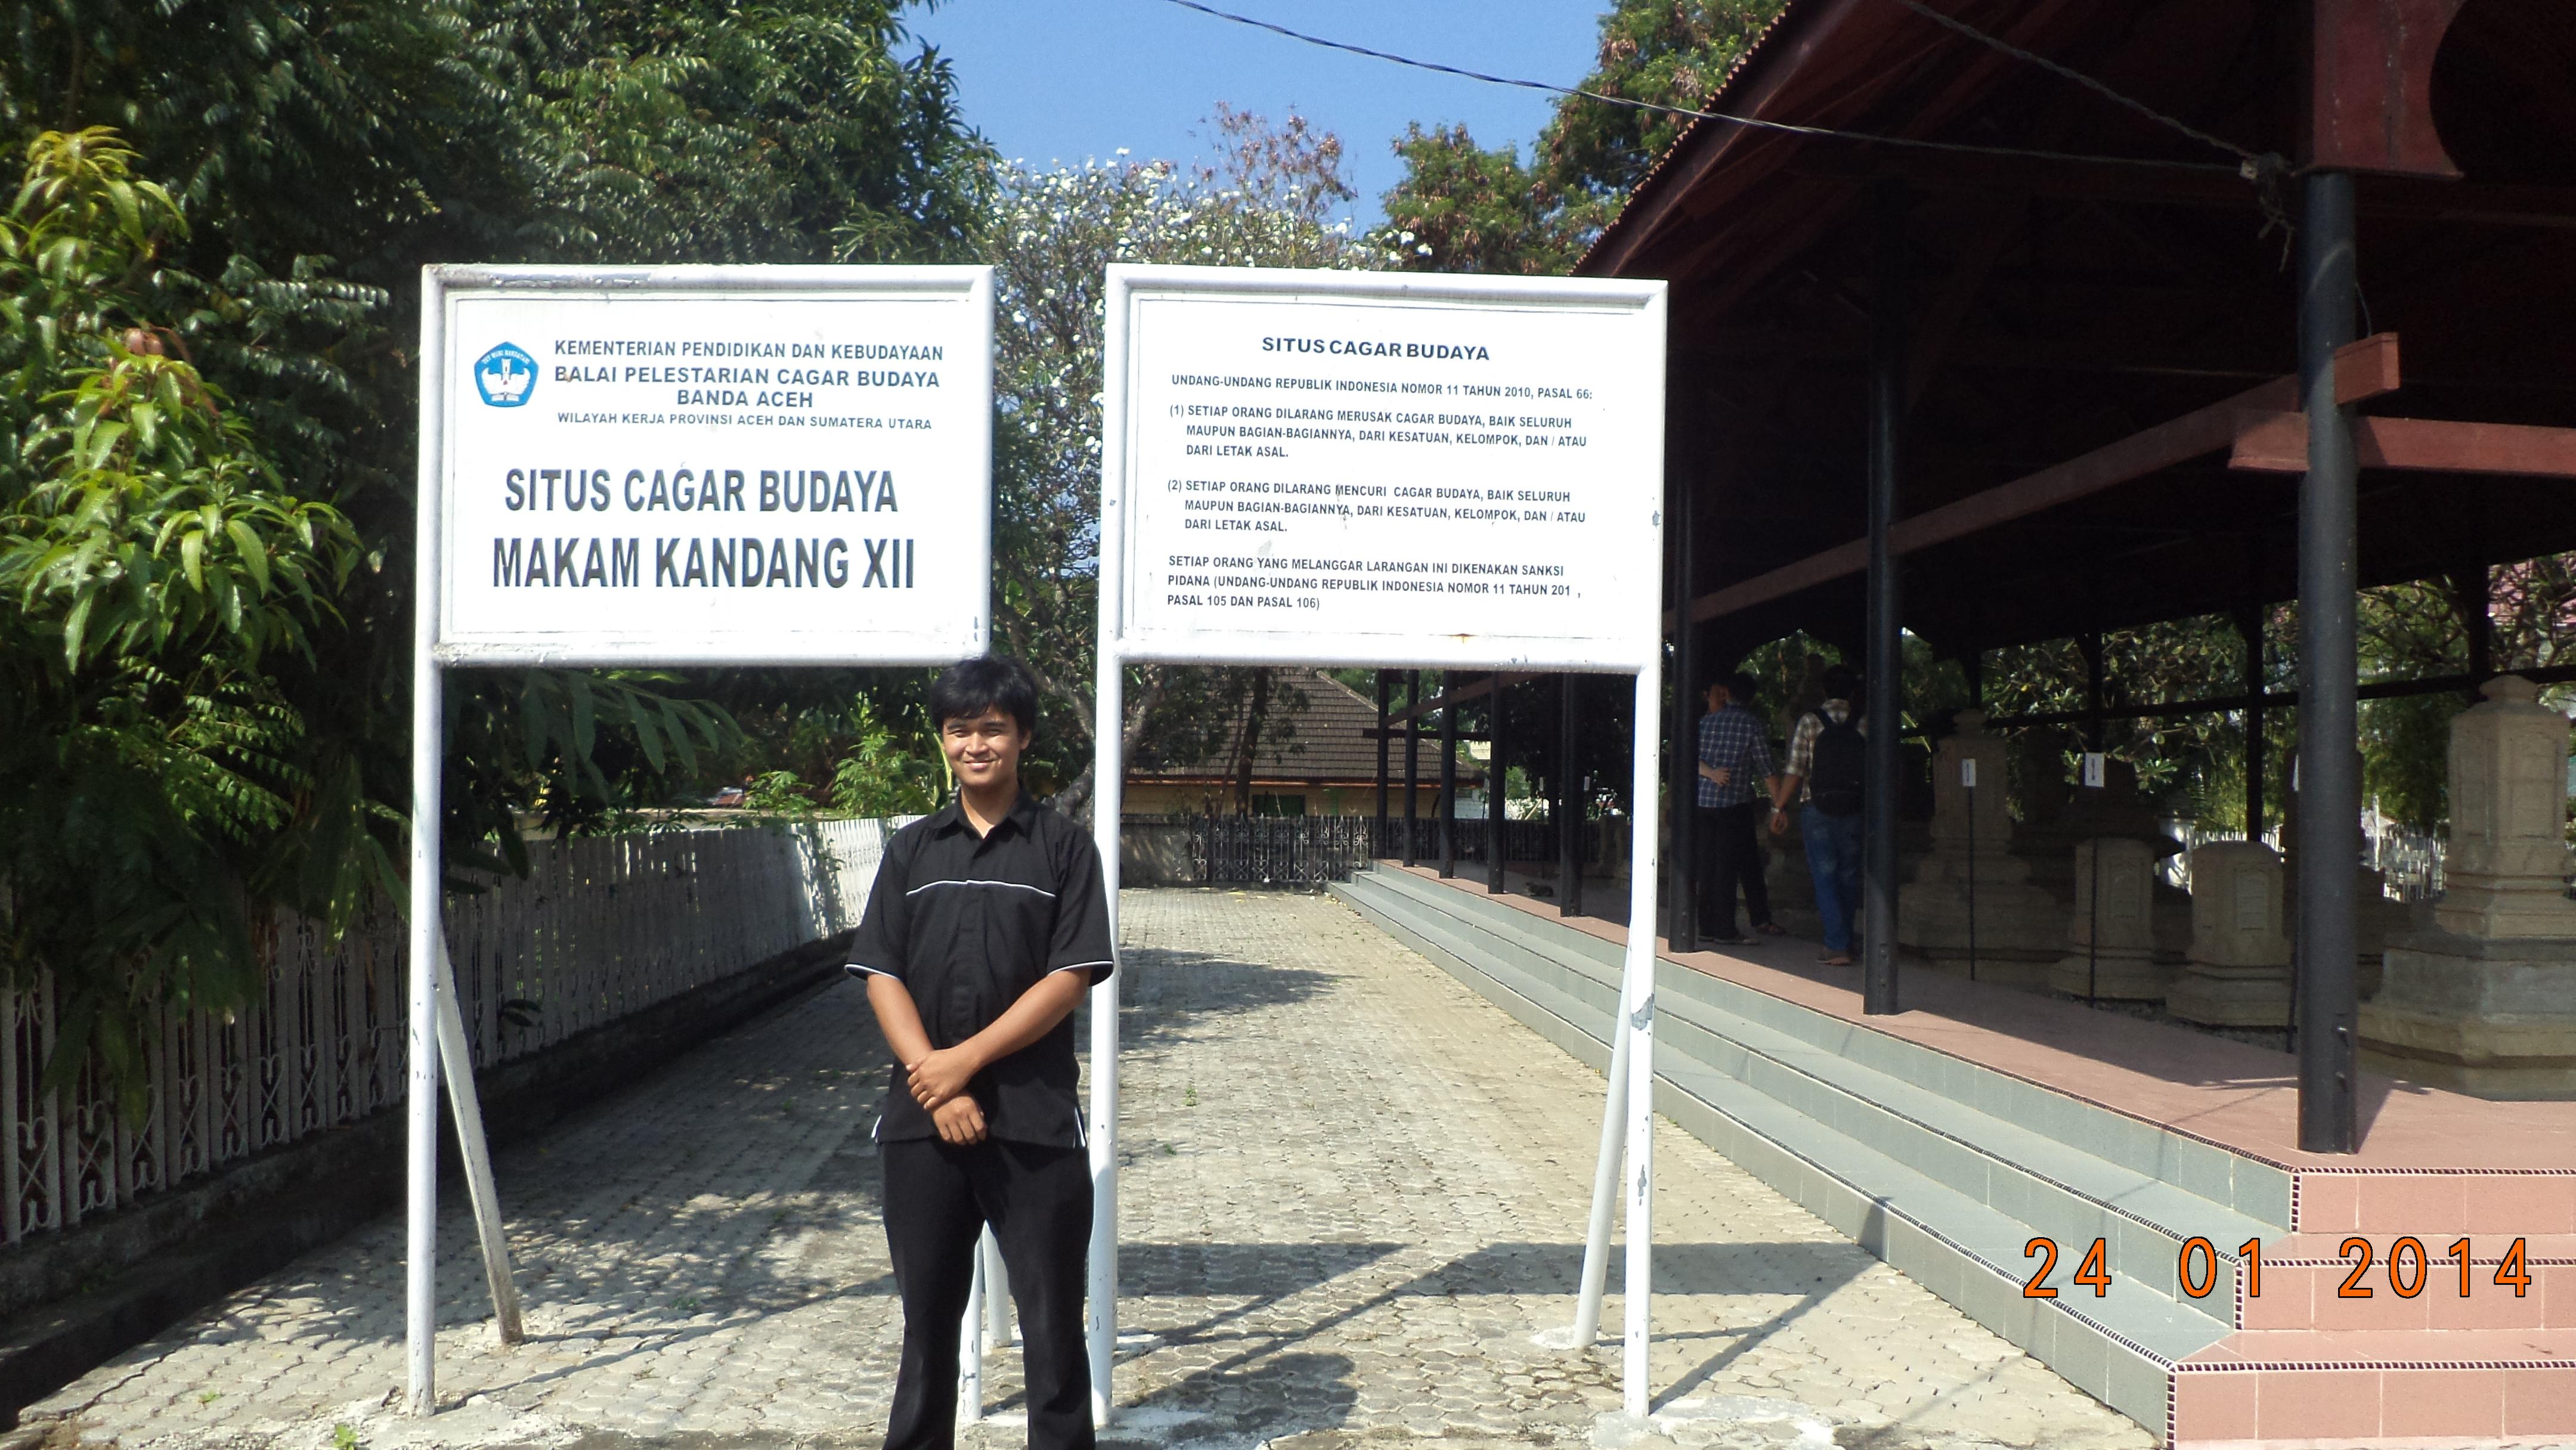 Pertamakali Banda Aceh Write Live Kandang Xii Kompleks Makam Sultan